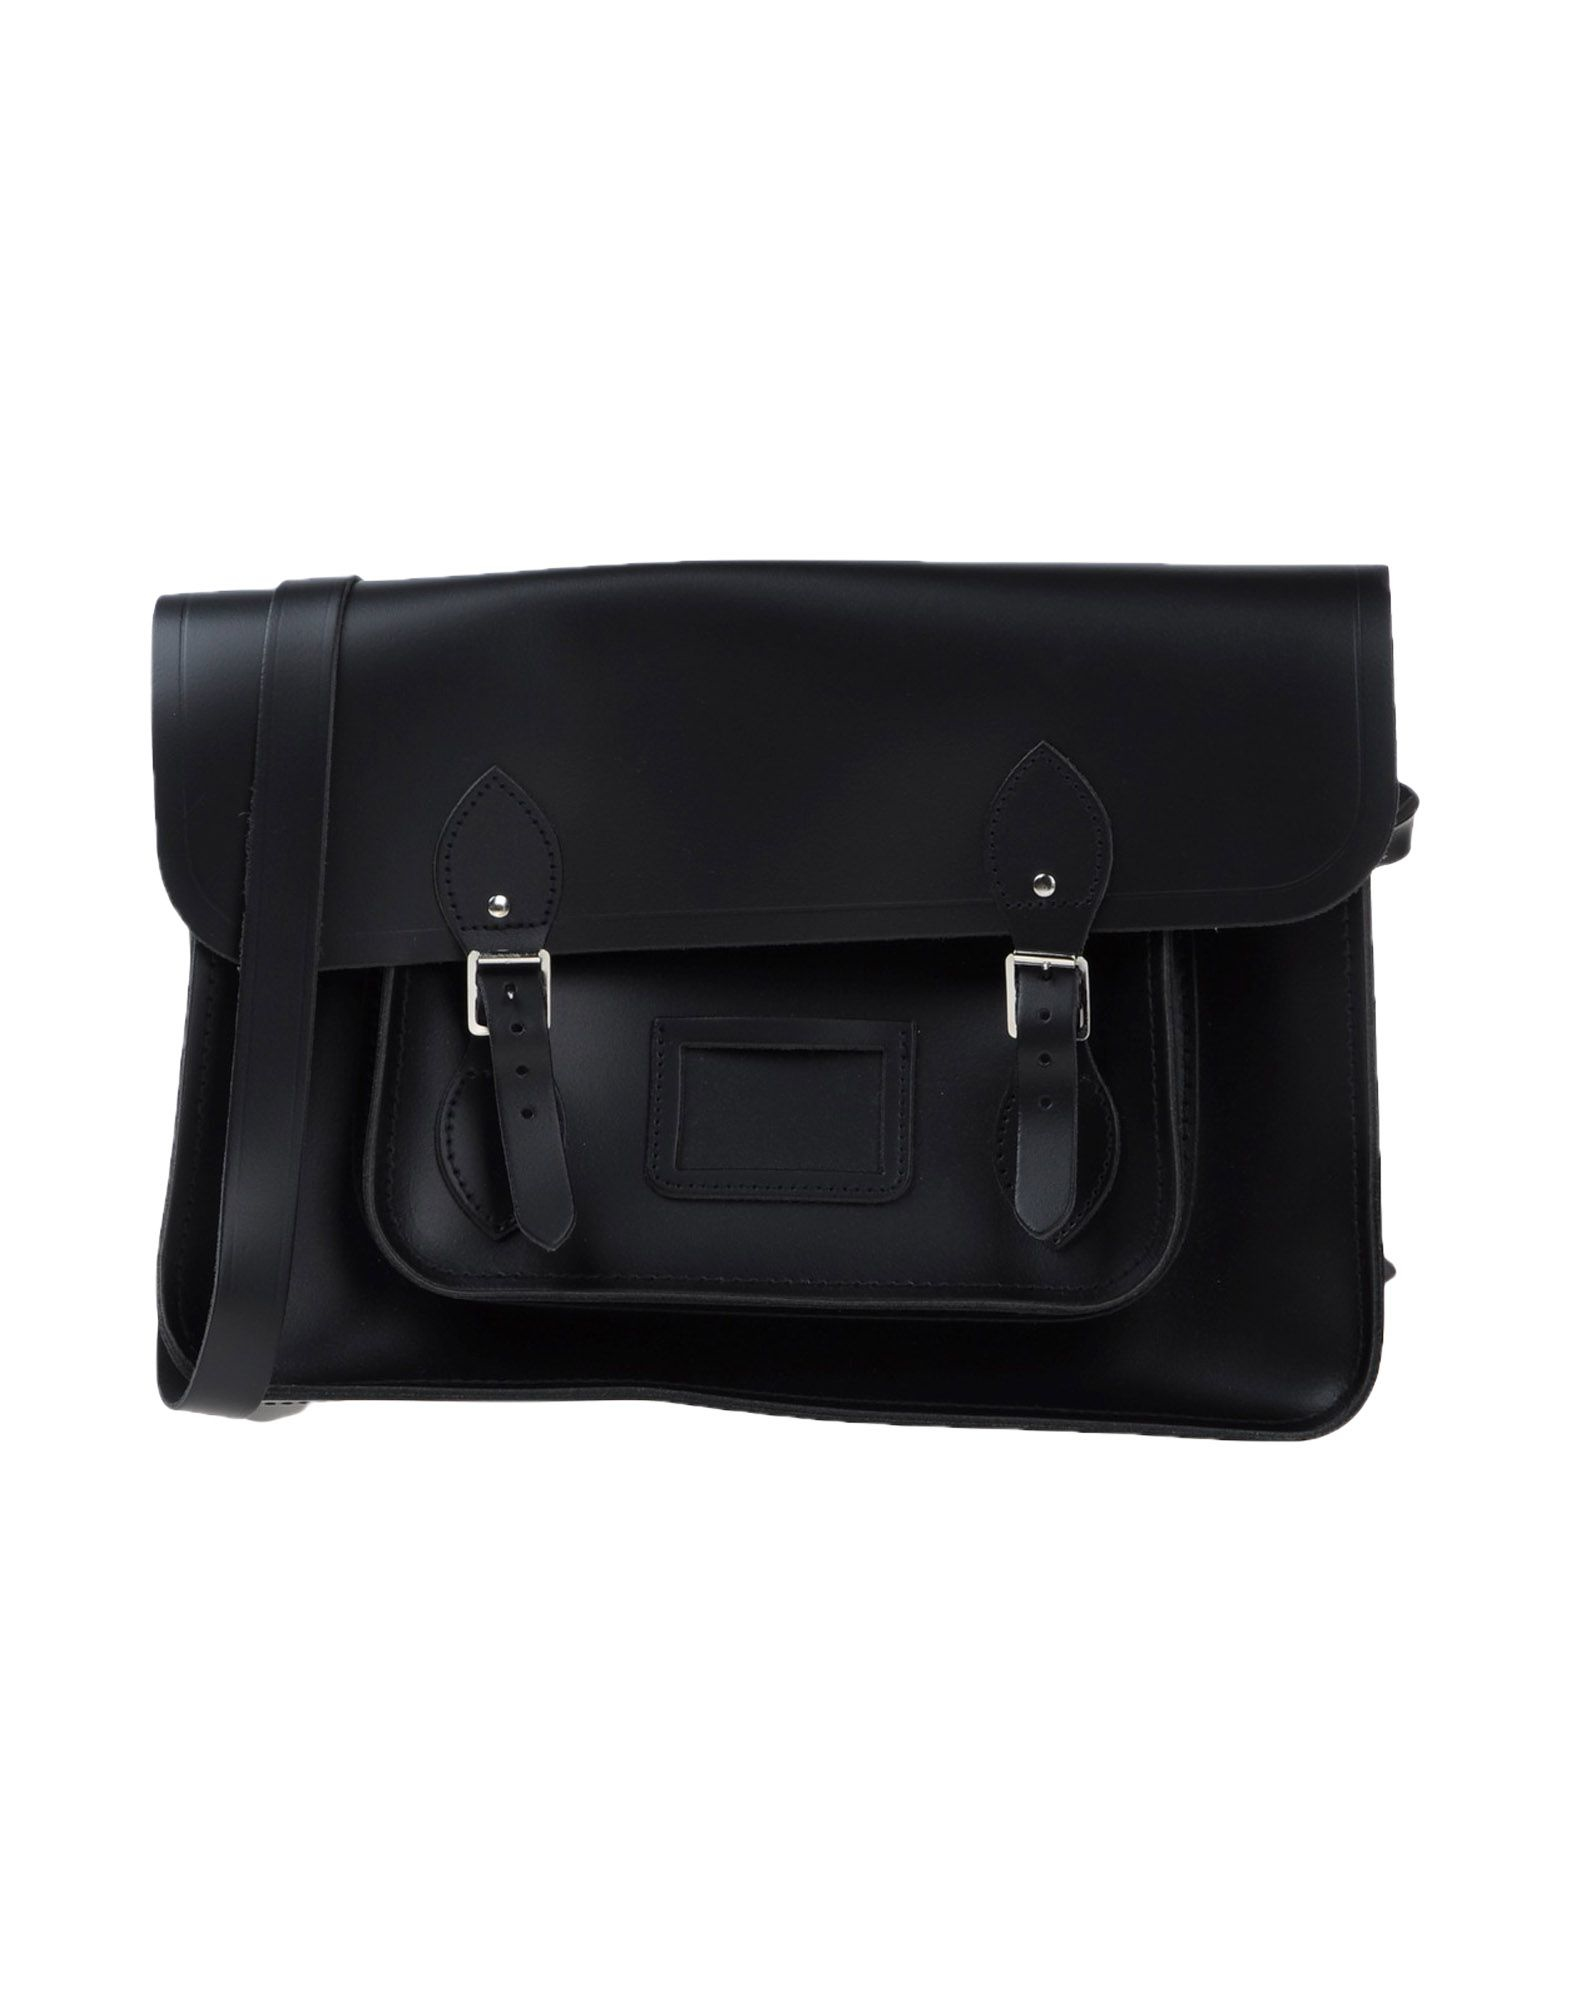 Cambridge satchel company Cross-body Bag in Black